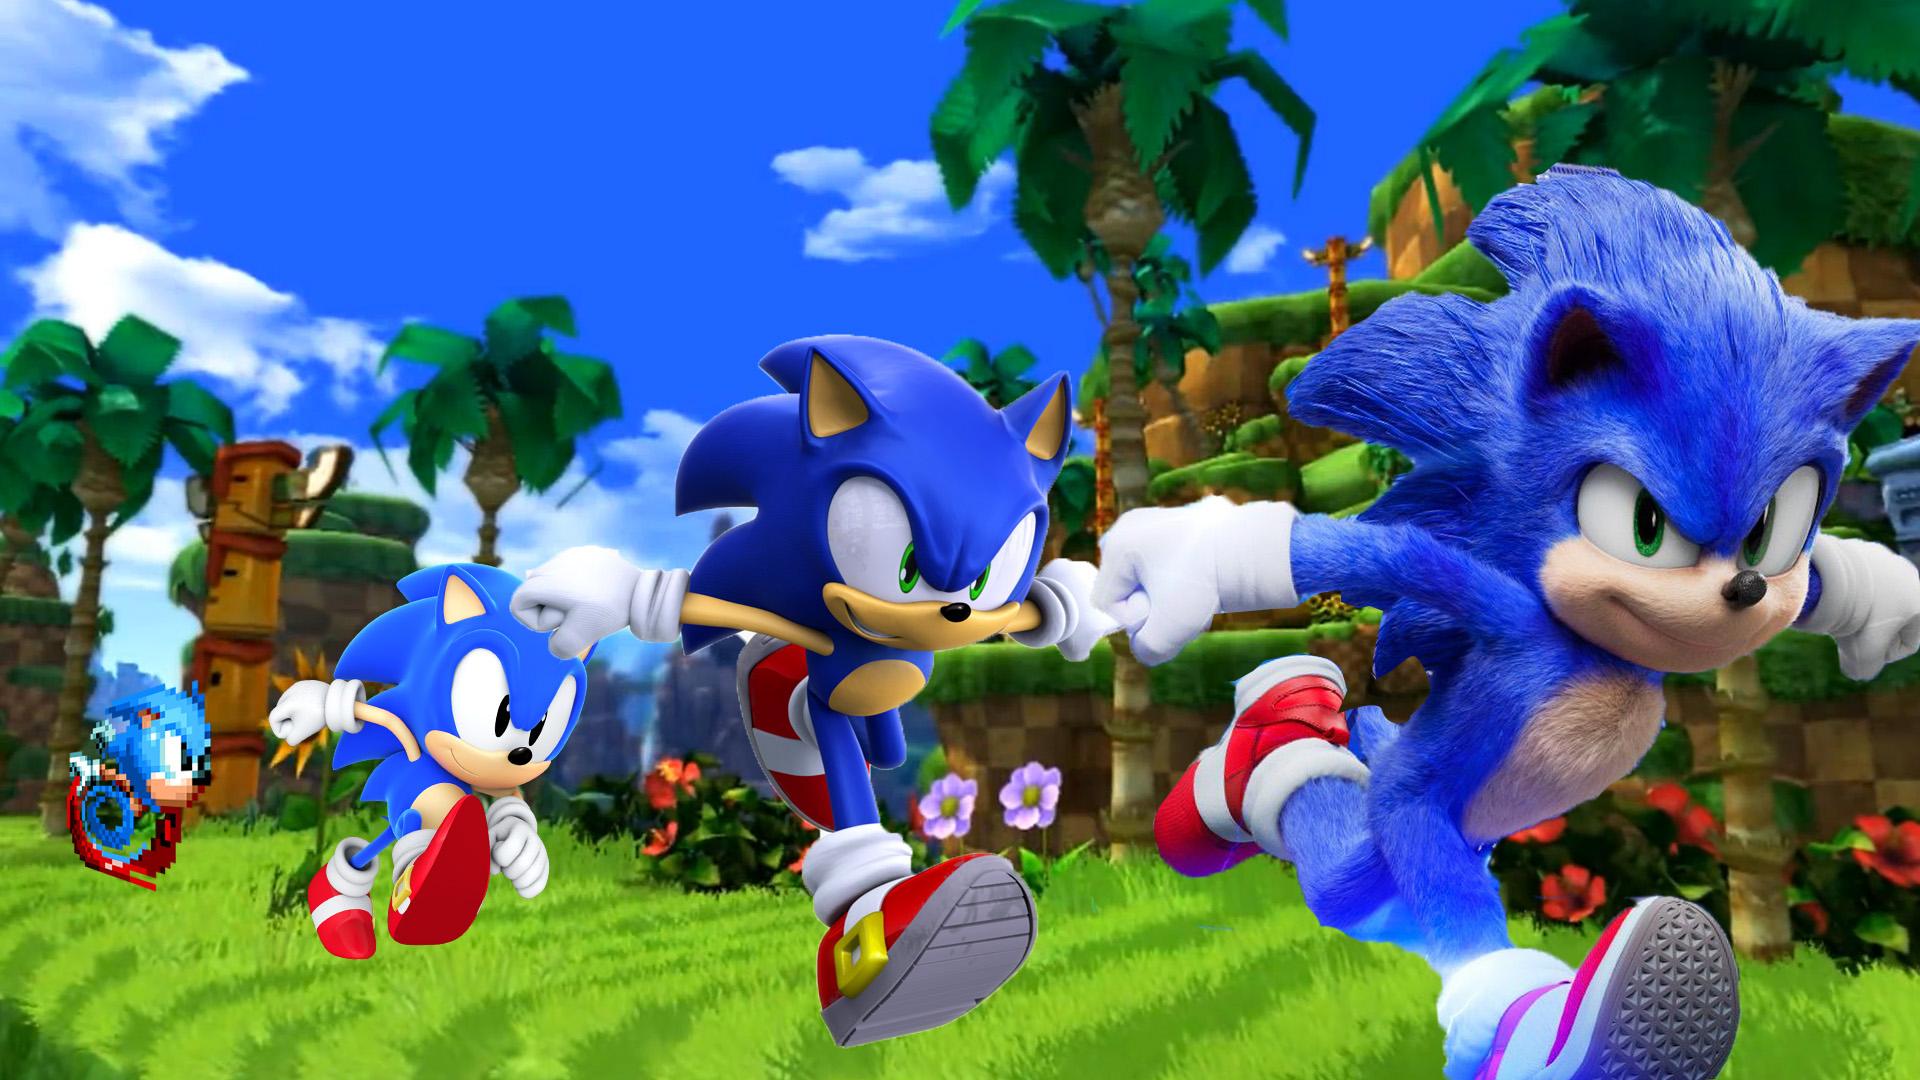 Sonic The Hedgehog Wallpaper By The Dark Mamba 995 On Deviantart